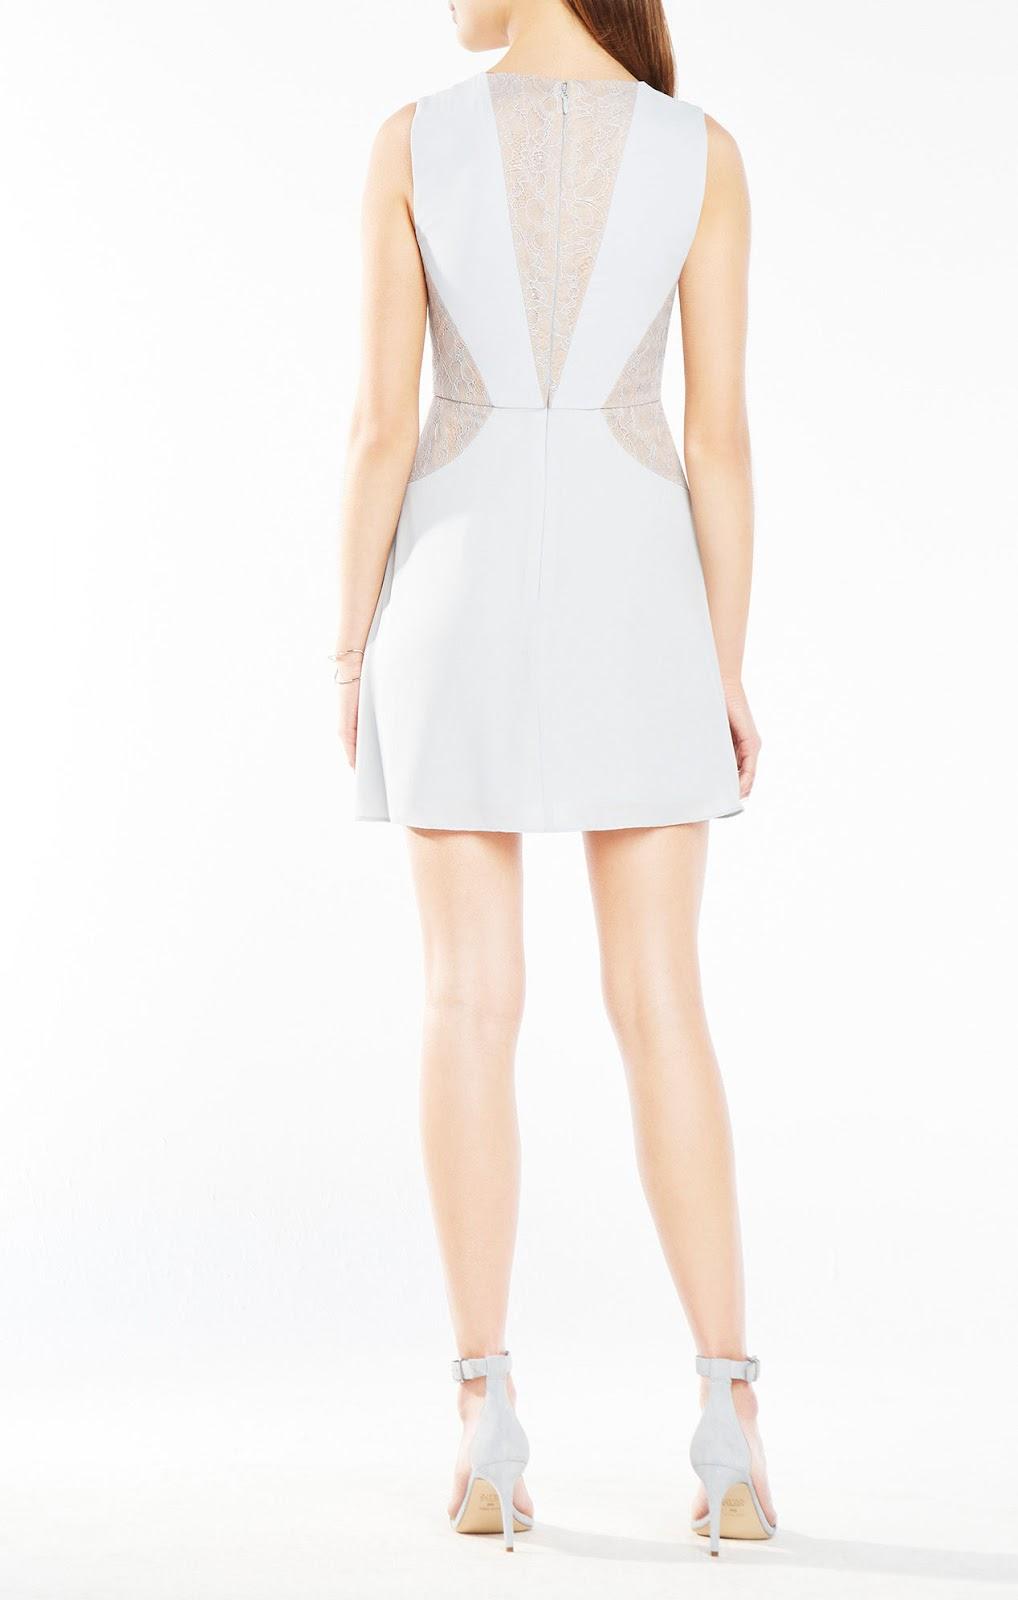 ccefa85bb20 Bcbg Blue Lace Dress Short - raveitsafe